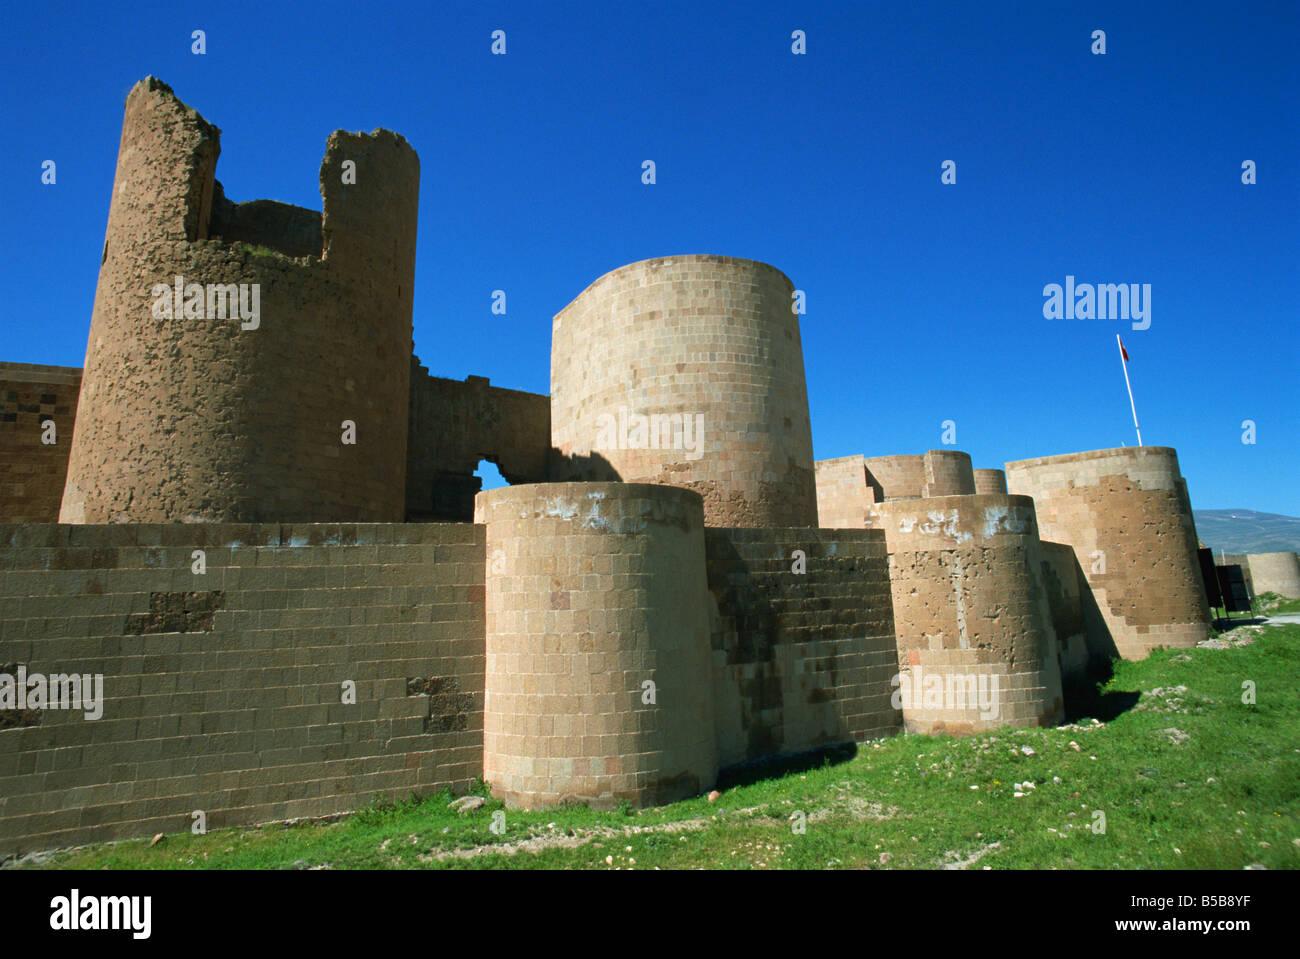 The walls Ani northeast Anatolia Turkey Asia Minor Eurasia - Stock Image